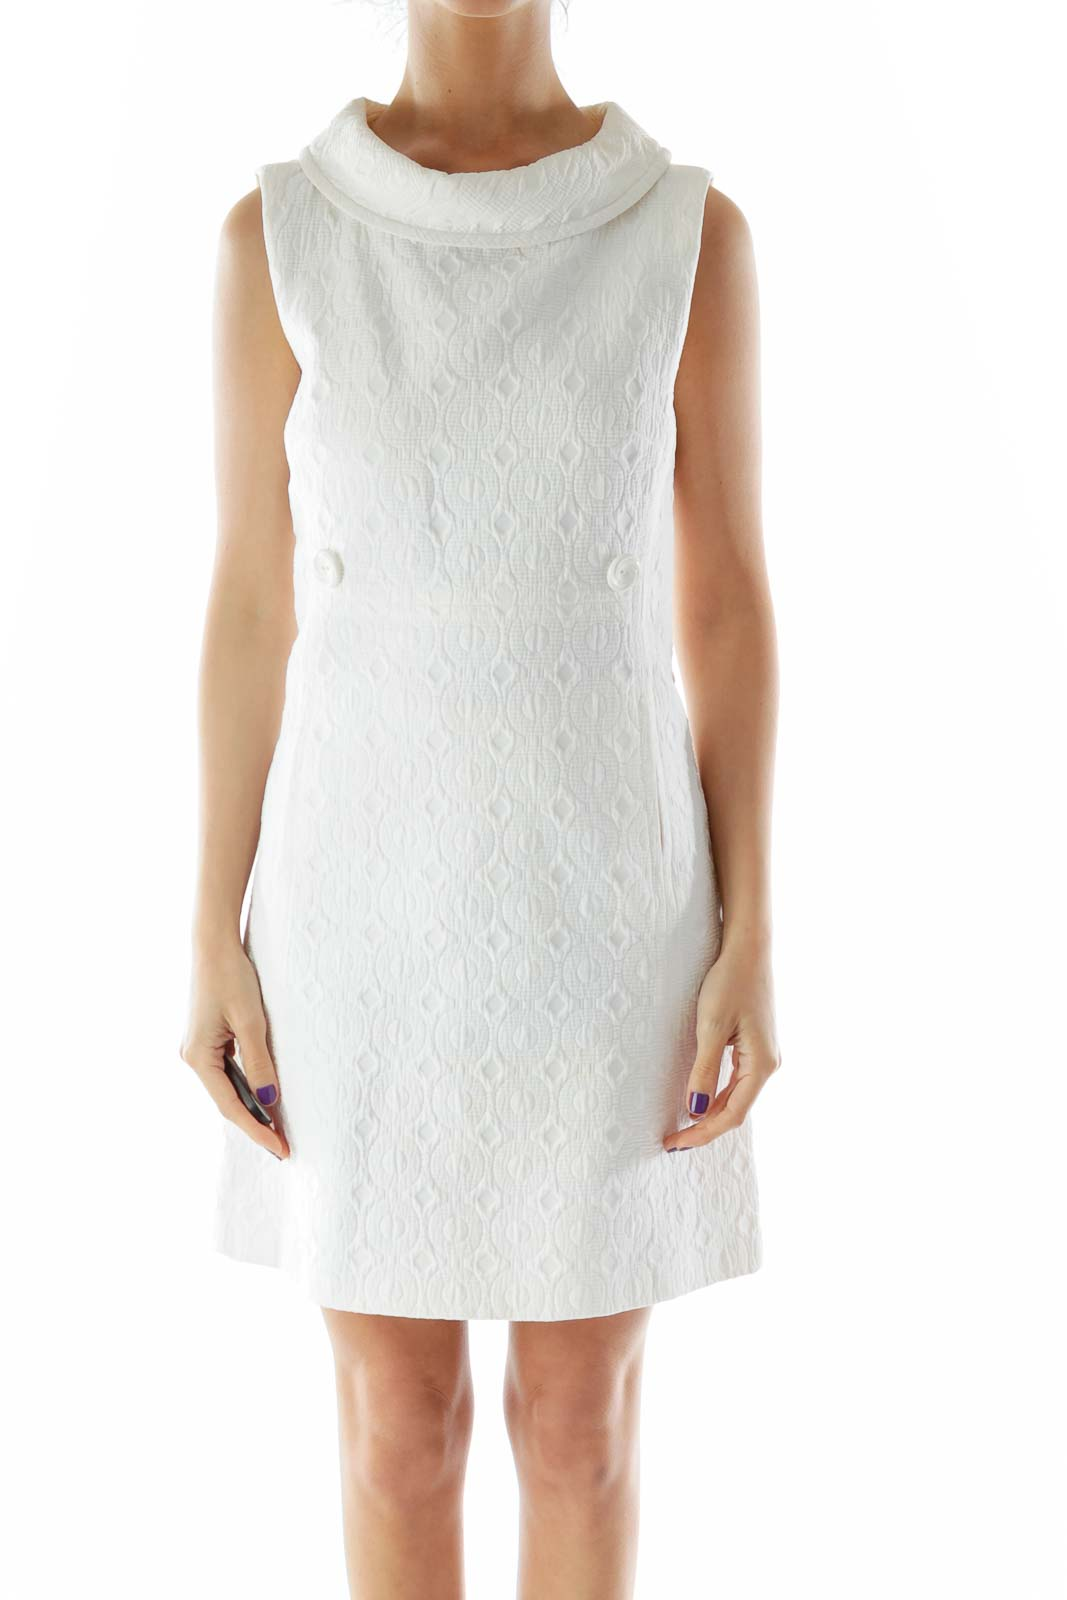 Off White Textured Work Dress Front